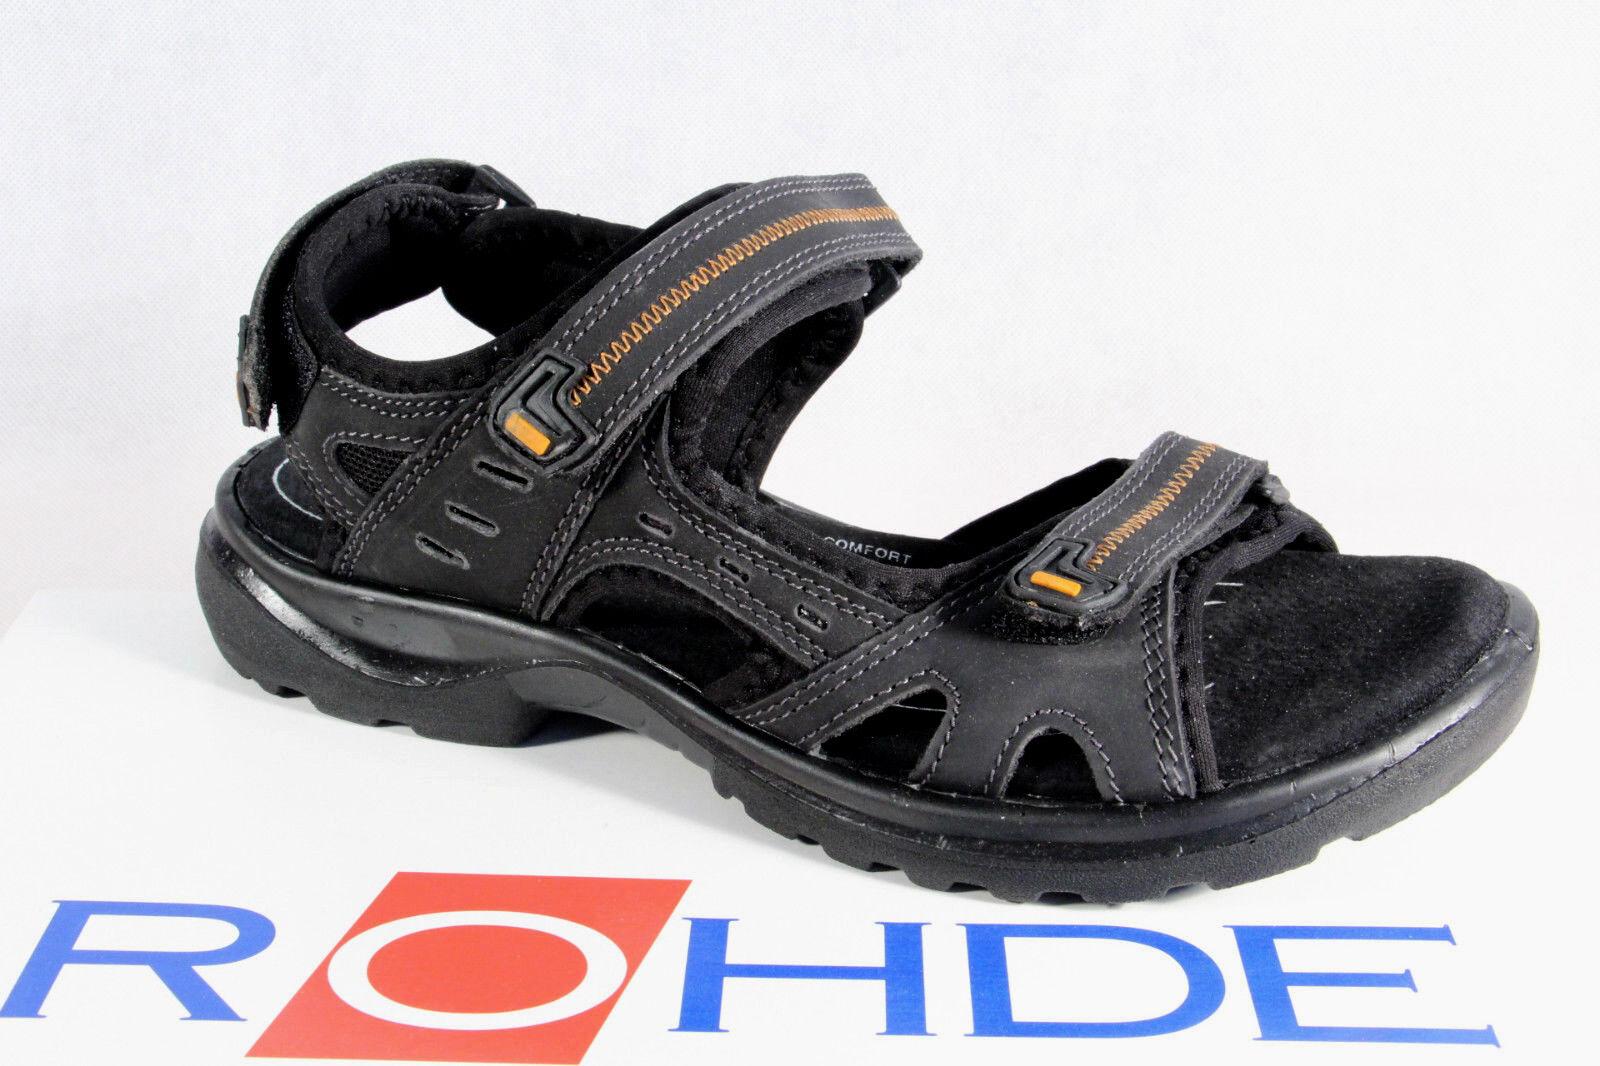 Rohde Women's Sandals Sandals Black Sneakers Width G Black Sandals New 7efc02